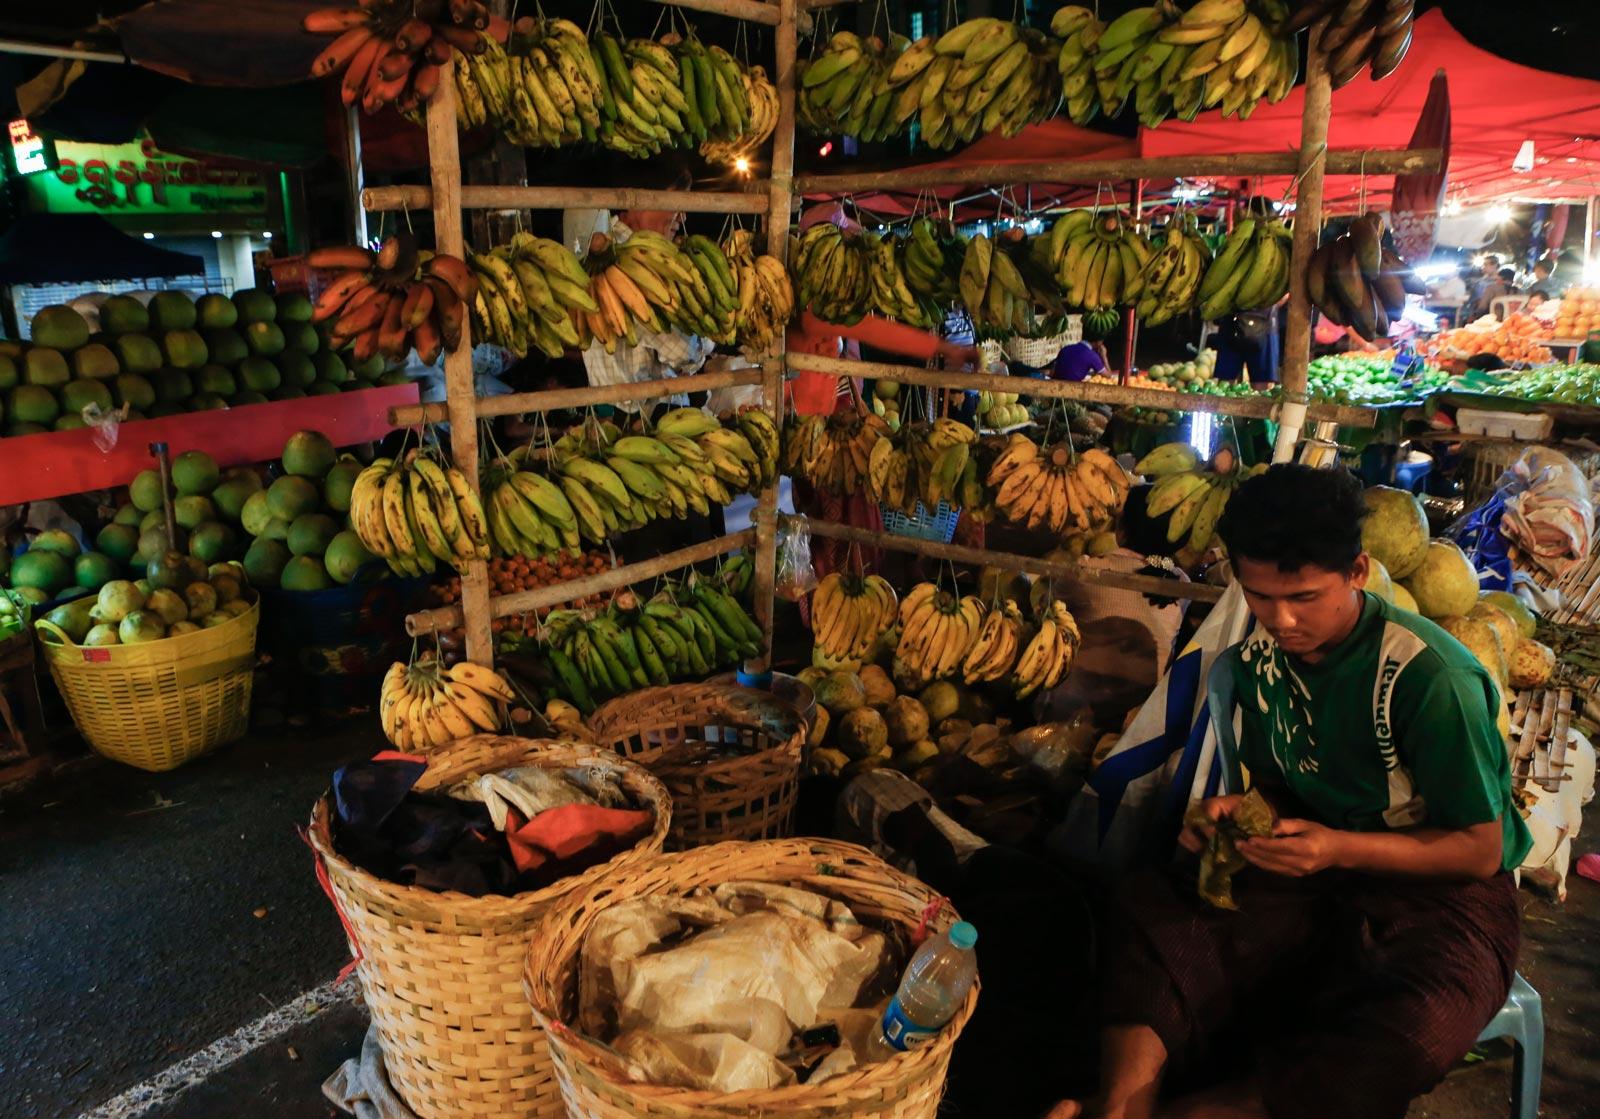 Bananas for sale in Yangon street market. Photo: EPA/Lynn Bo Bo